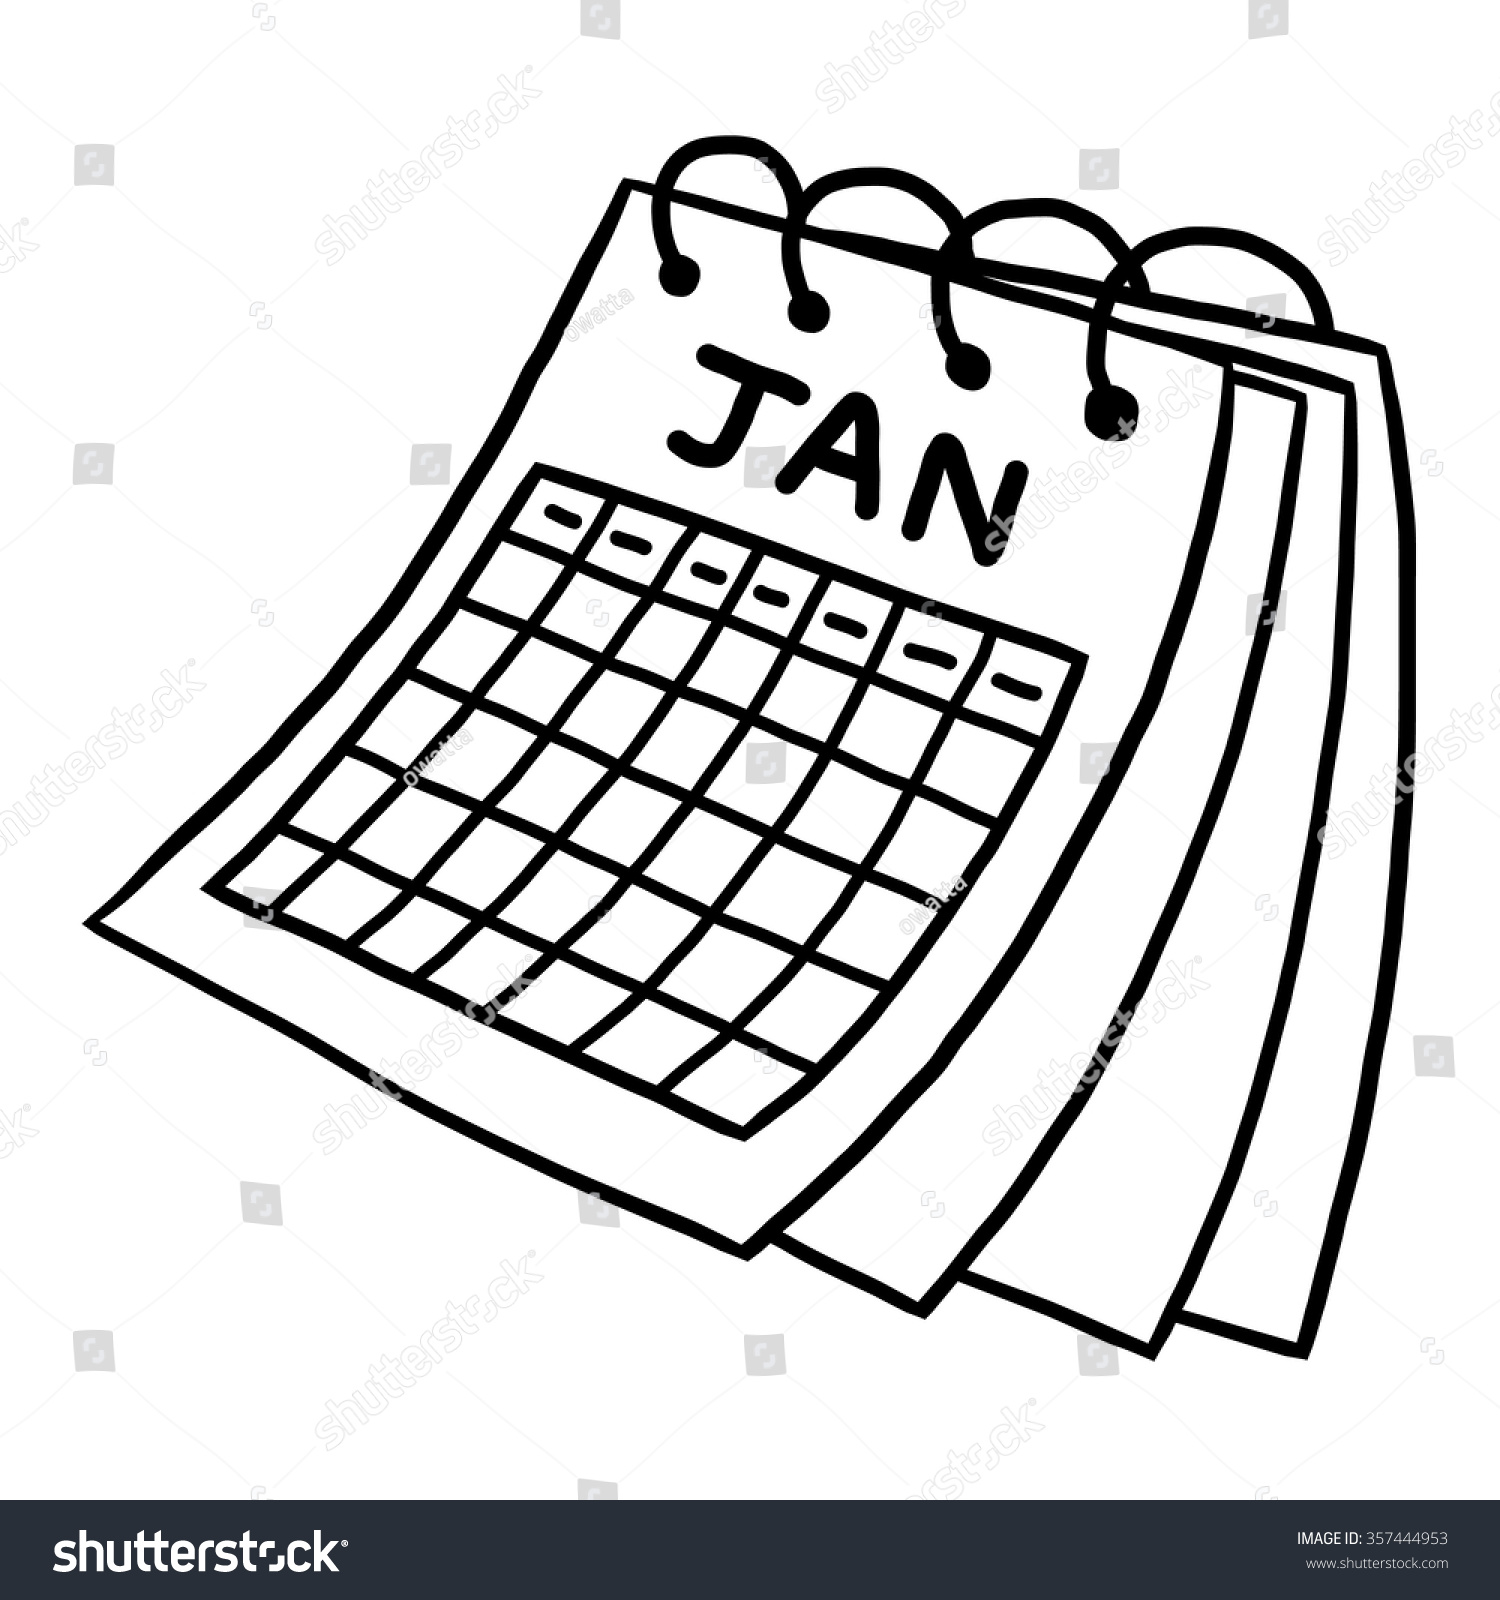 Calendar Drawing Pictures : Calendar january cartoon vector illustration black stock